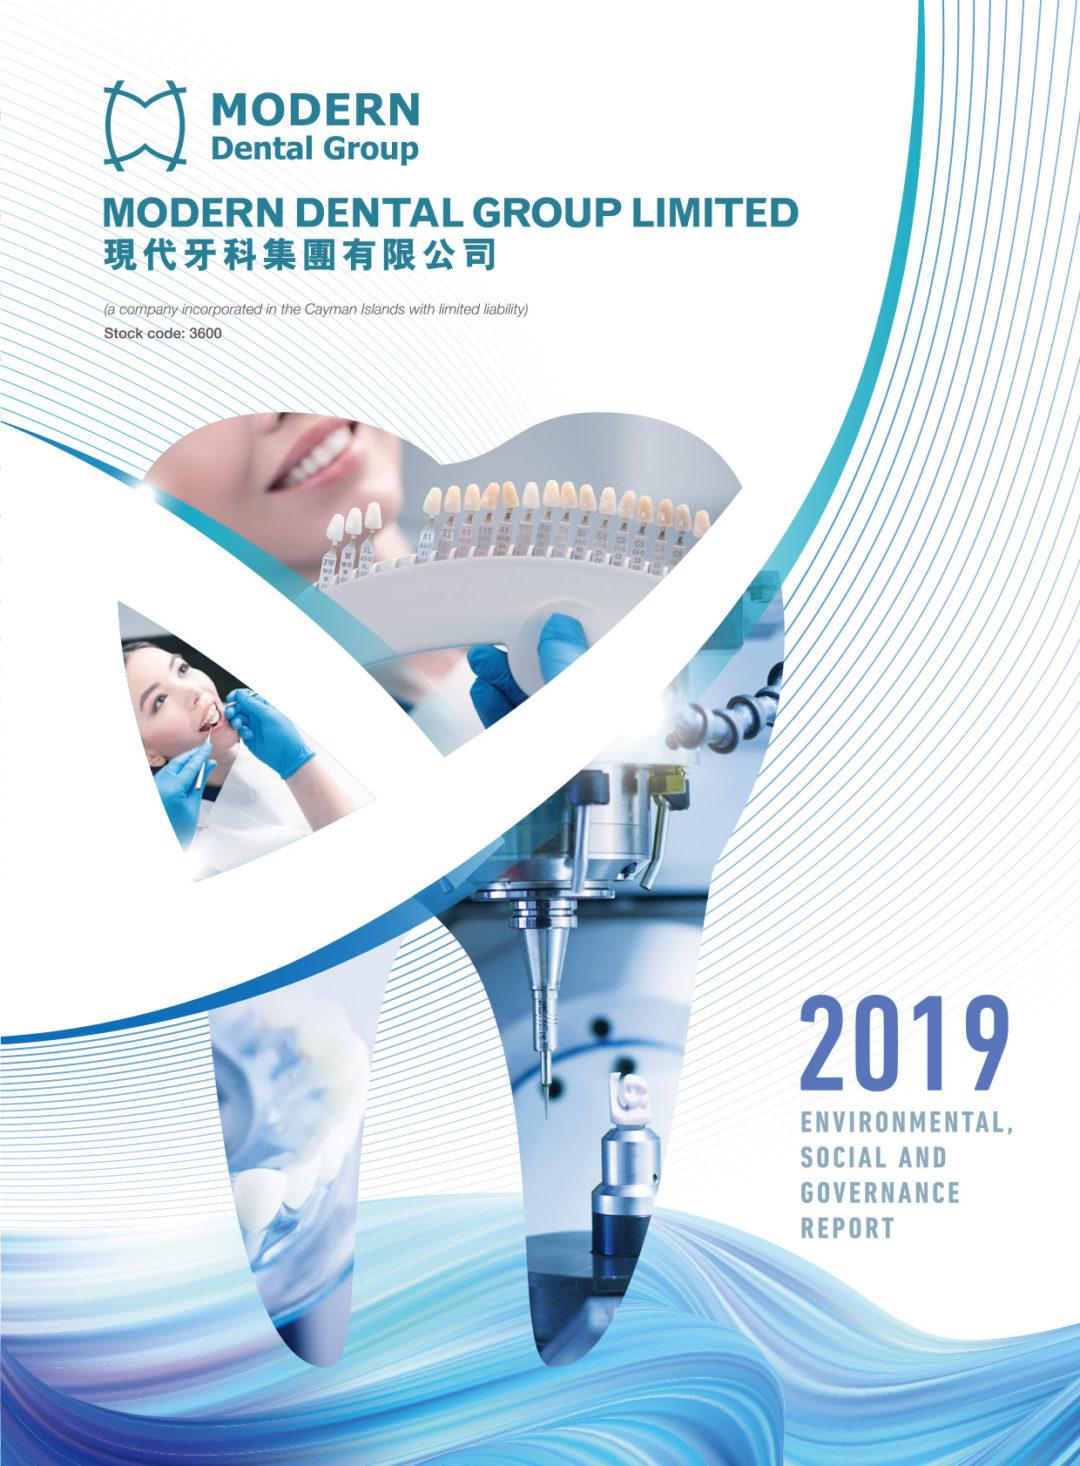 Modern Dental Group Limited ESG